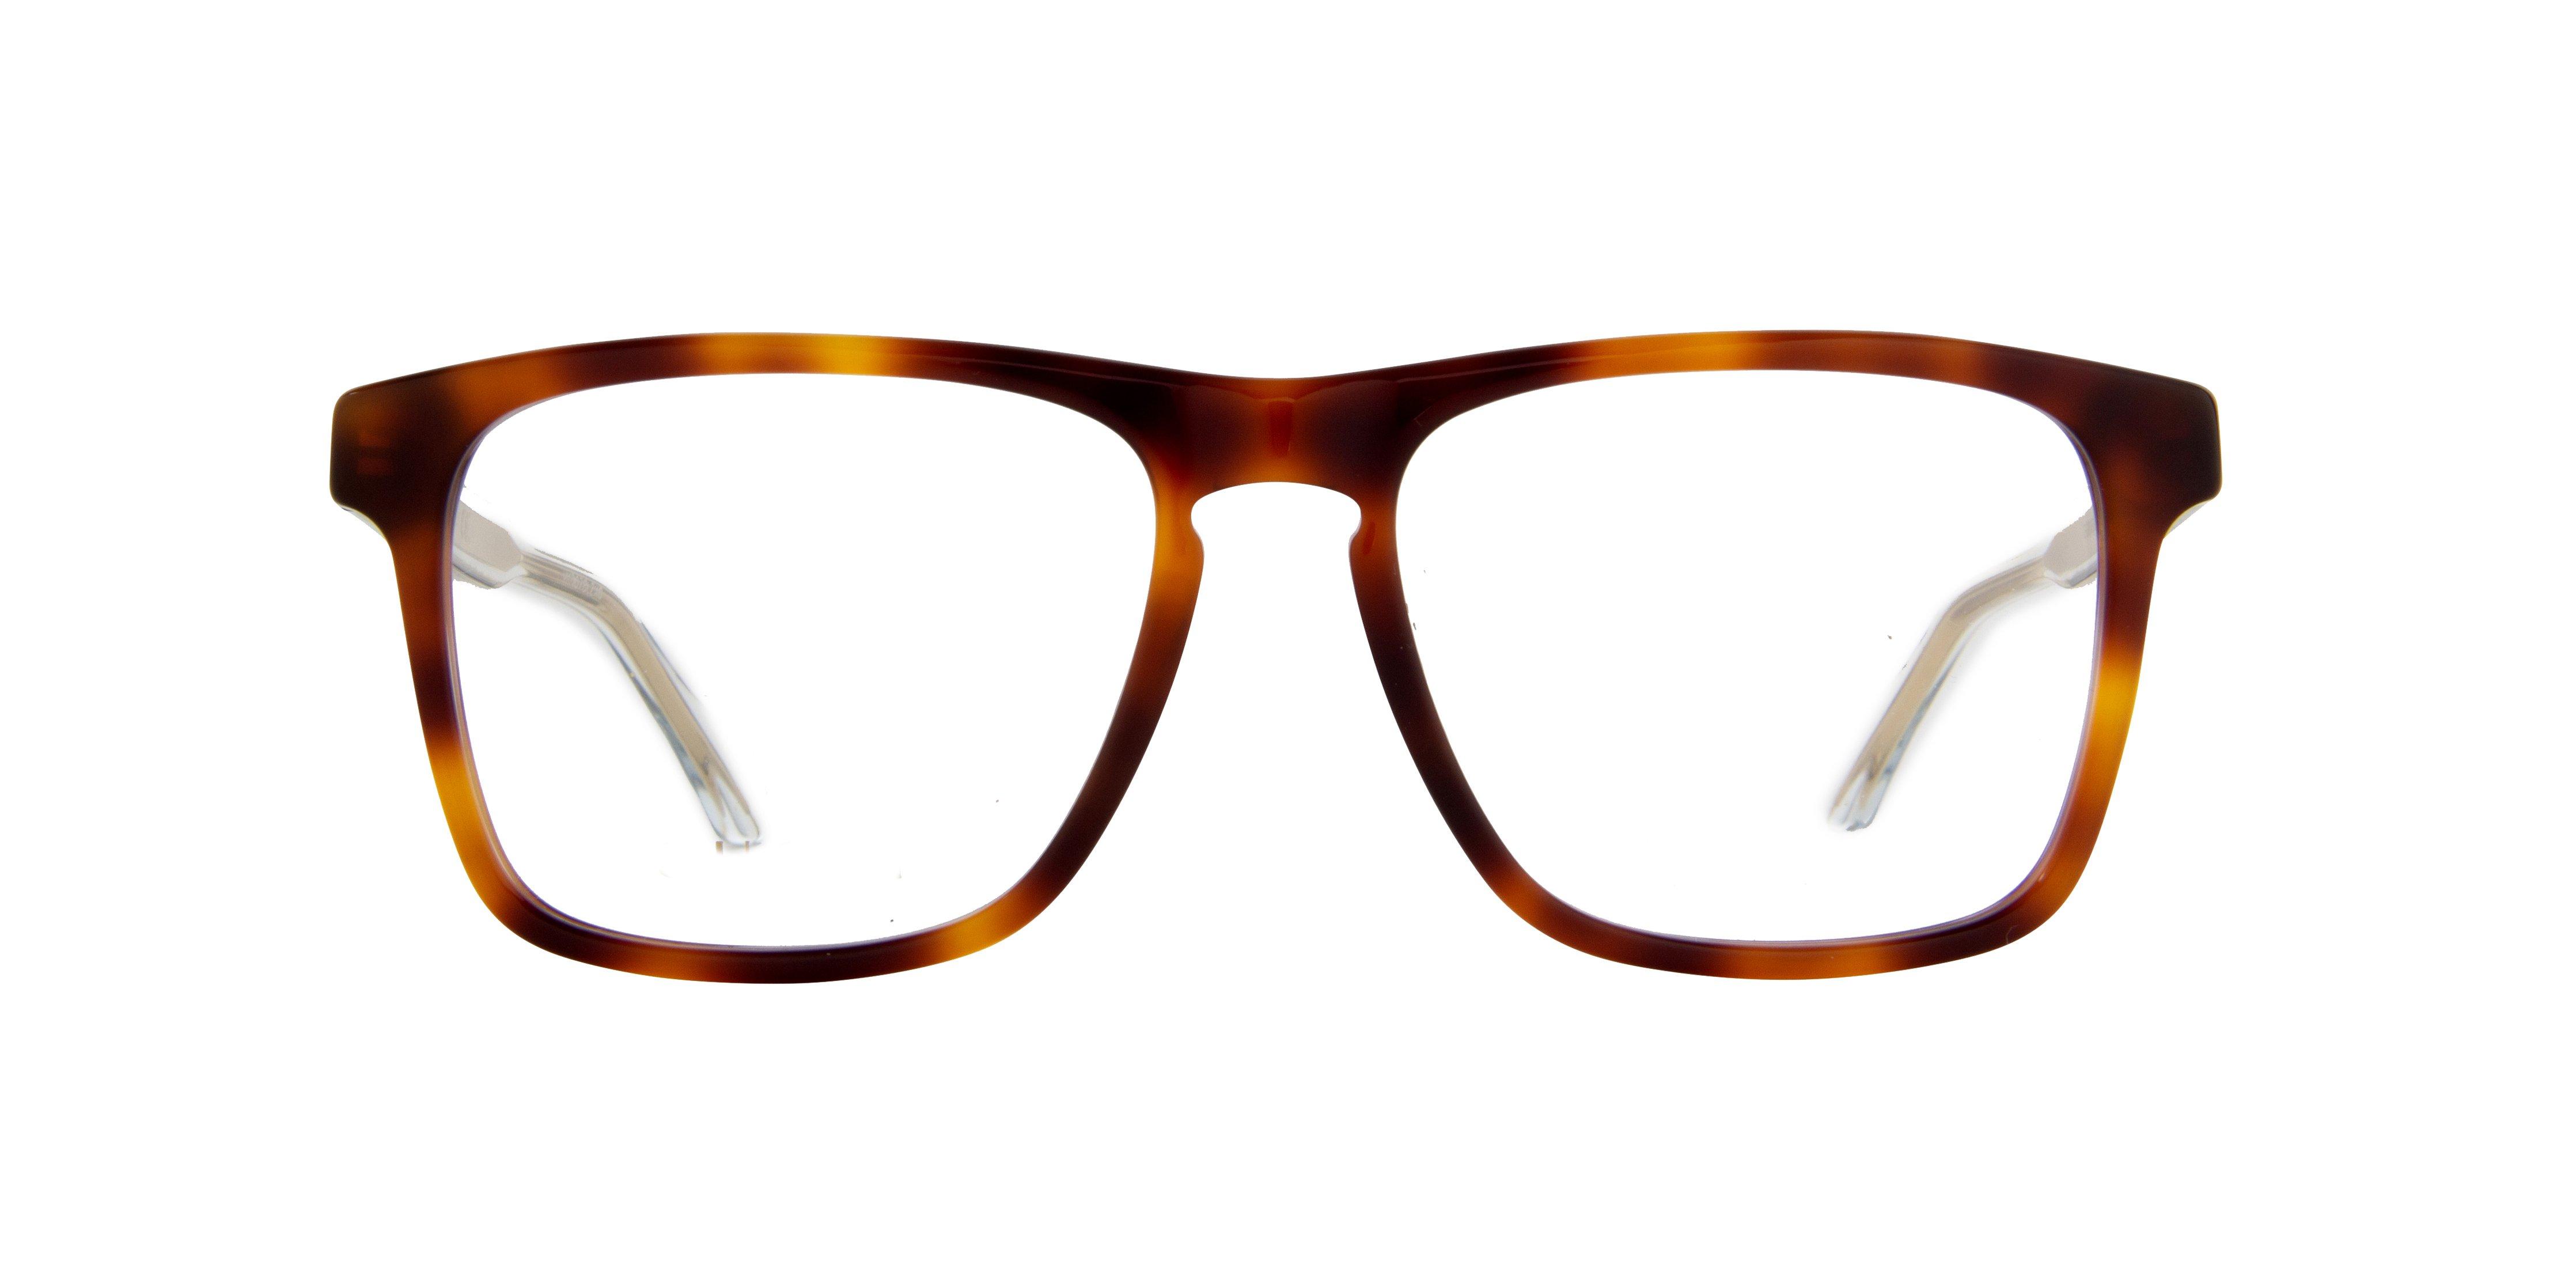 Gucci Clear Rectangular Eyeglasses Gg0561o002 54 In Brown